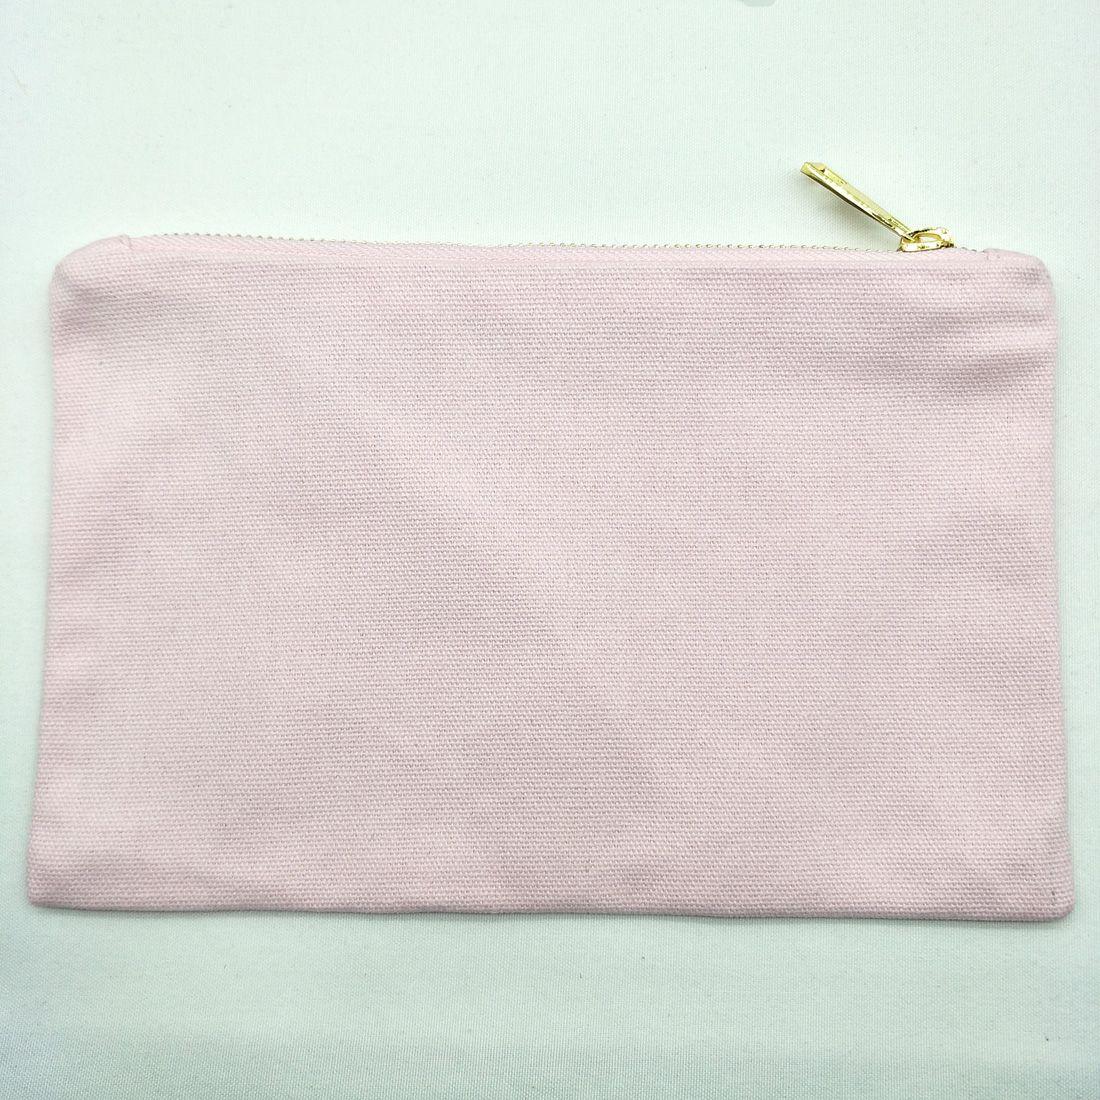 6x9in 라이트 핑크 12oz 캔버스 메이크업 가방, 골드 지퍼 골드 라이닝 베이비 핑크 화장품 가방 세면 도구 파우치 신부 들러리 선물 메이크업 가방 오거나이저